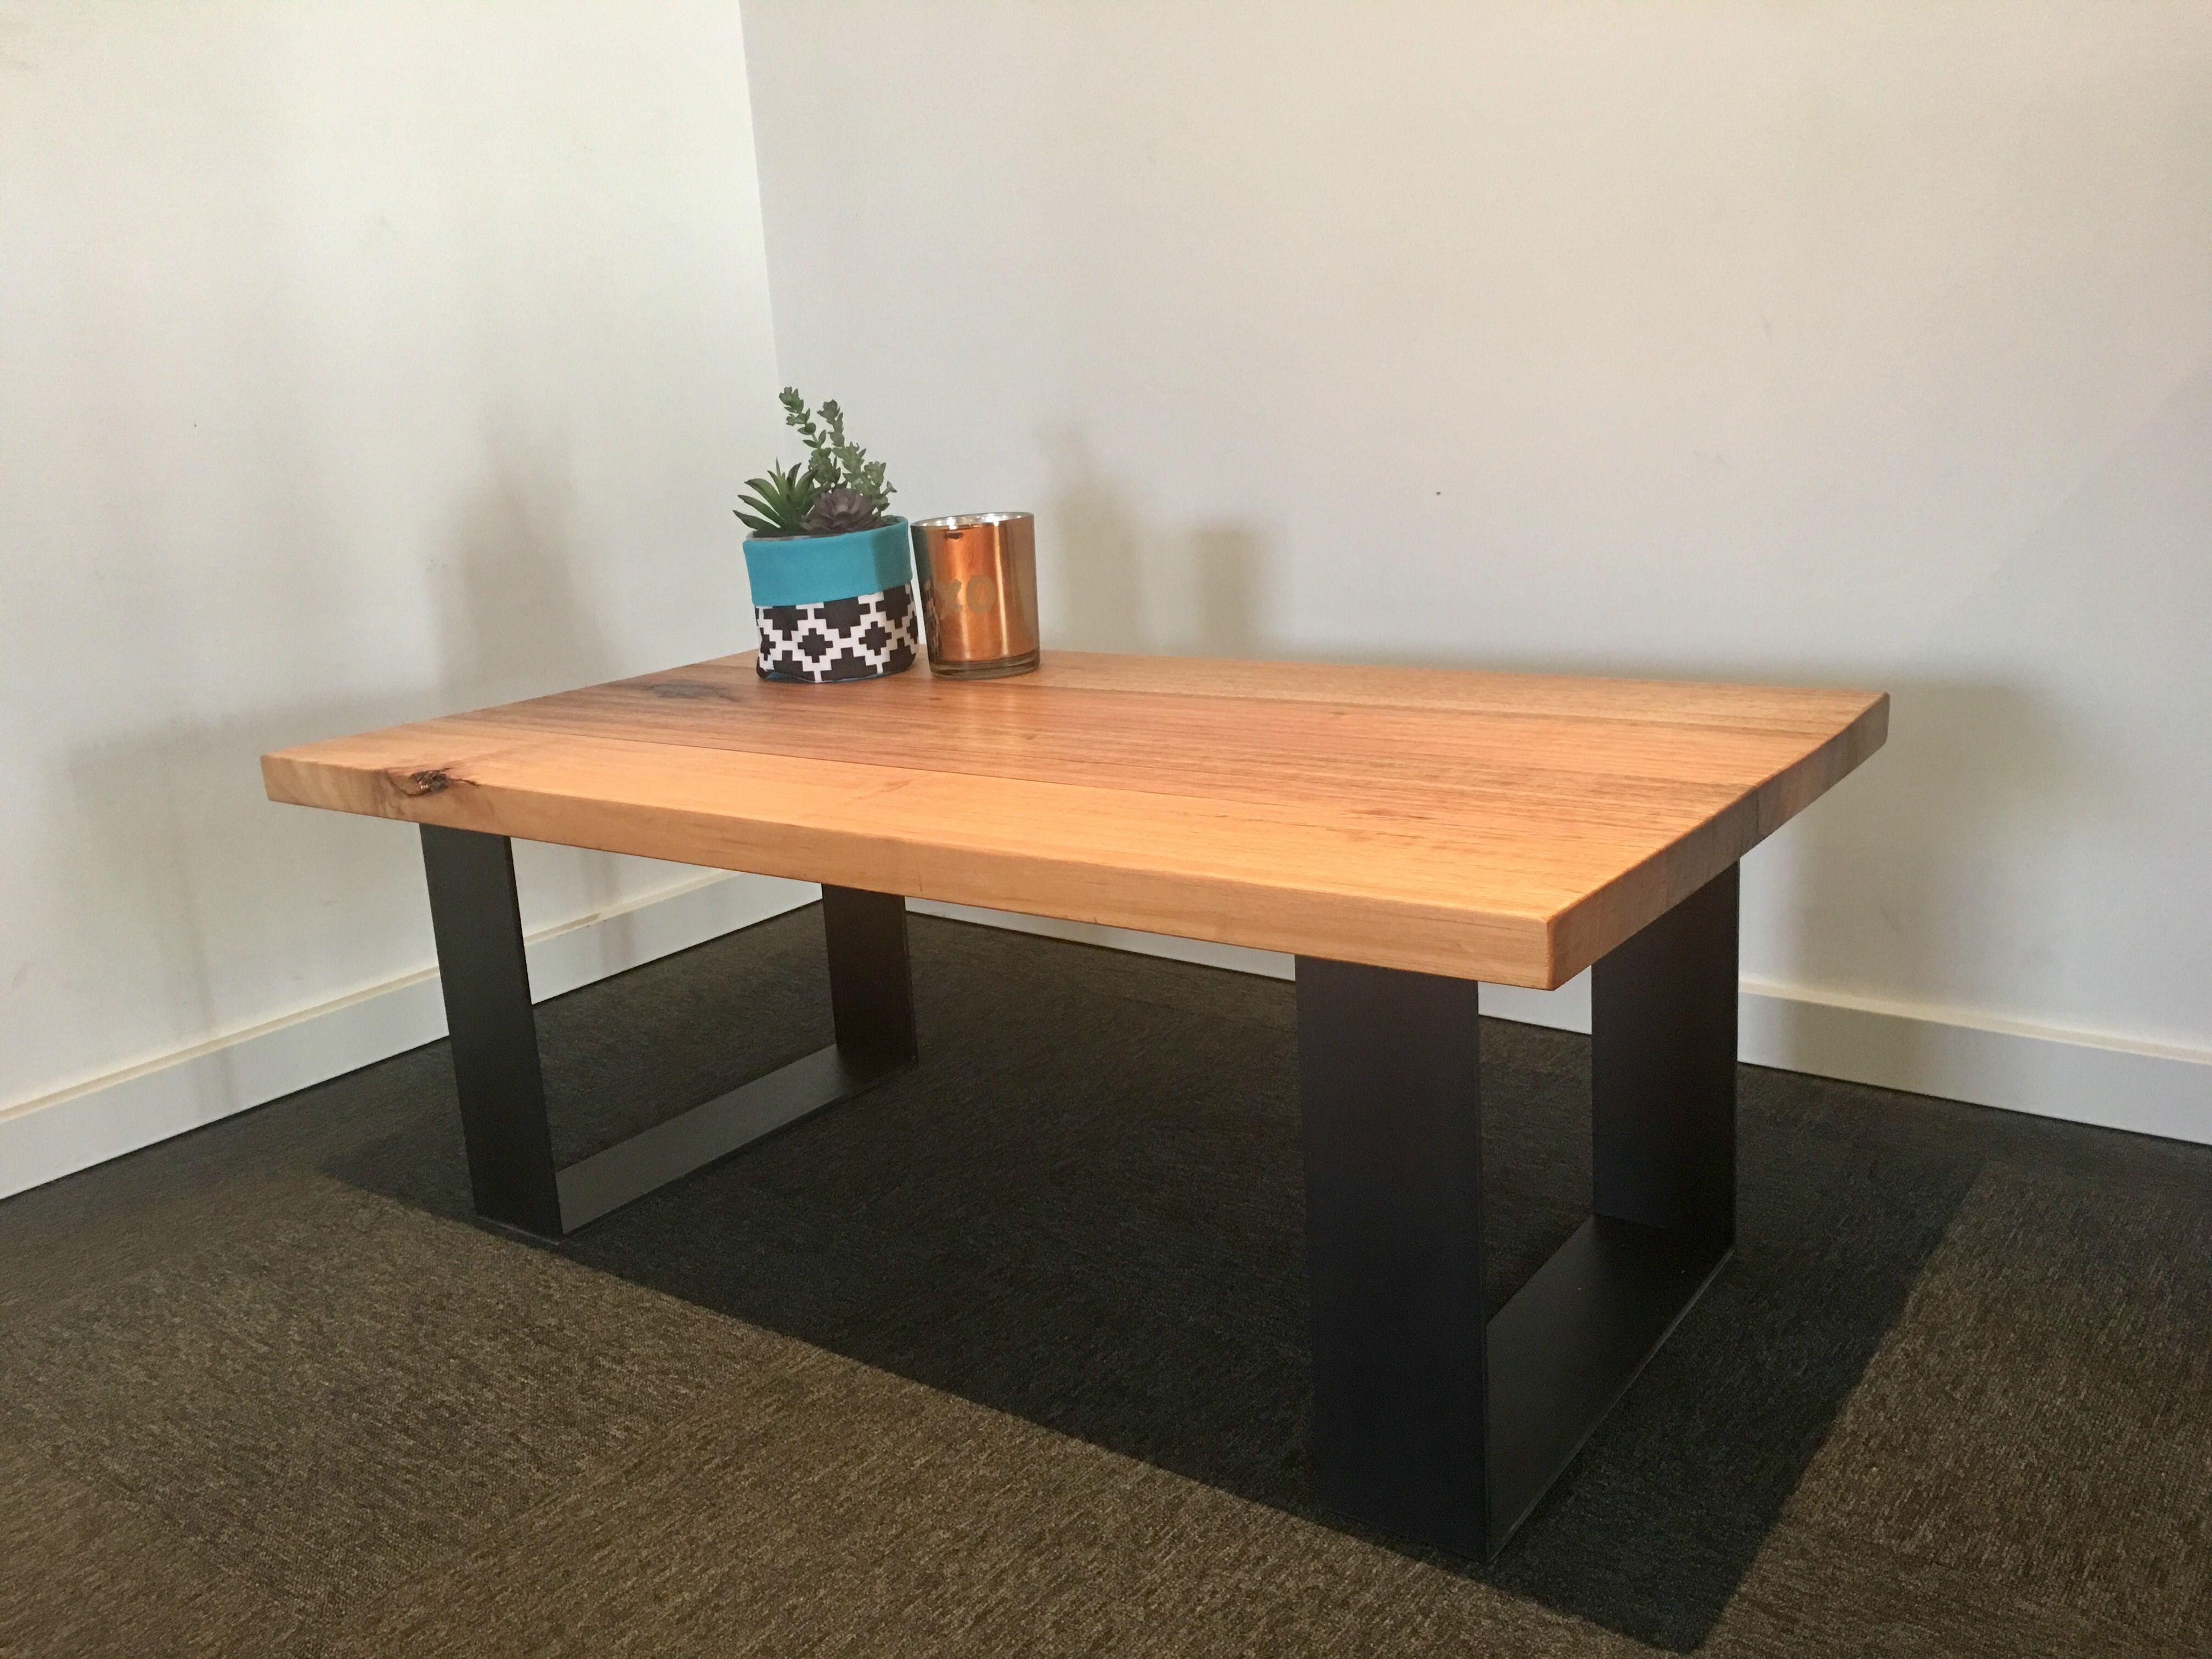 Recycled Tasmanian oak coffee table with black metal legs